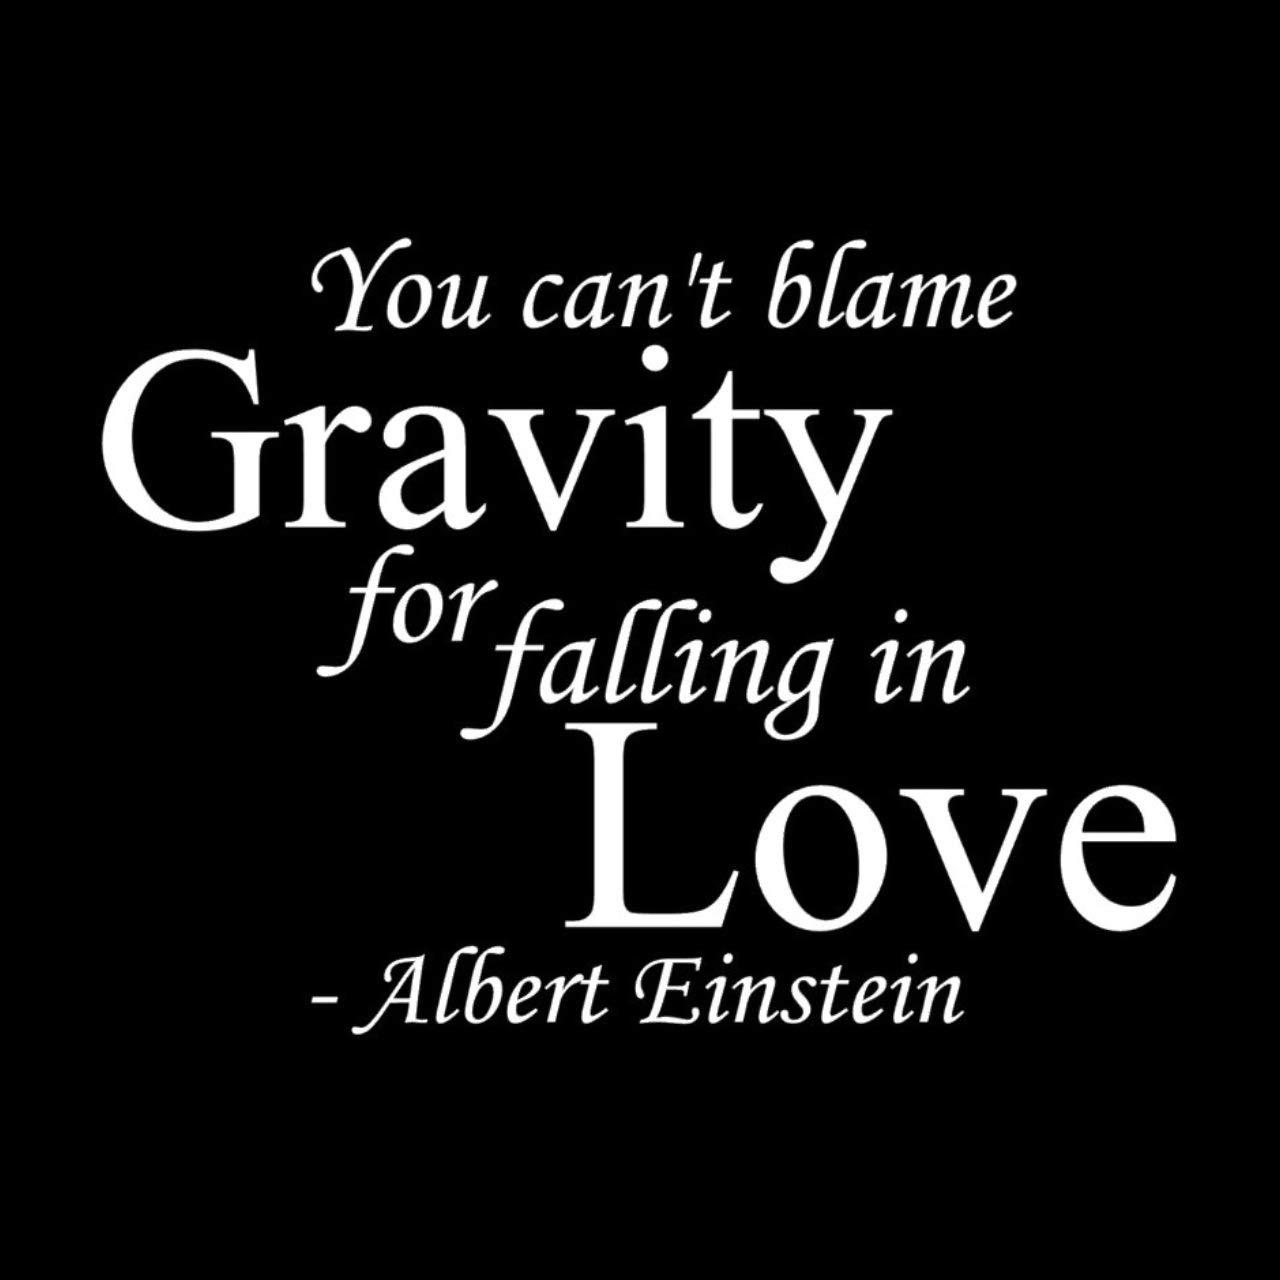 Amazon アインシュタイン 名言 You Can T Blame Gravity For Falling